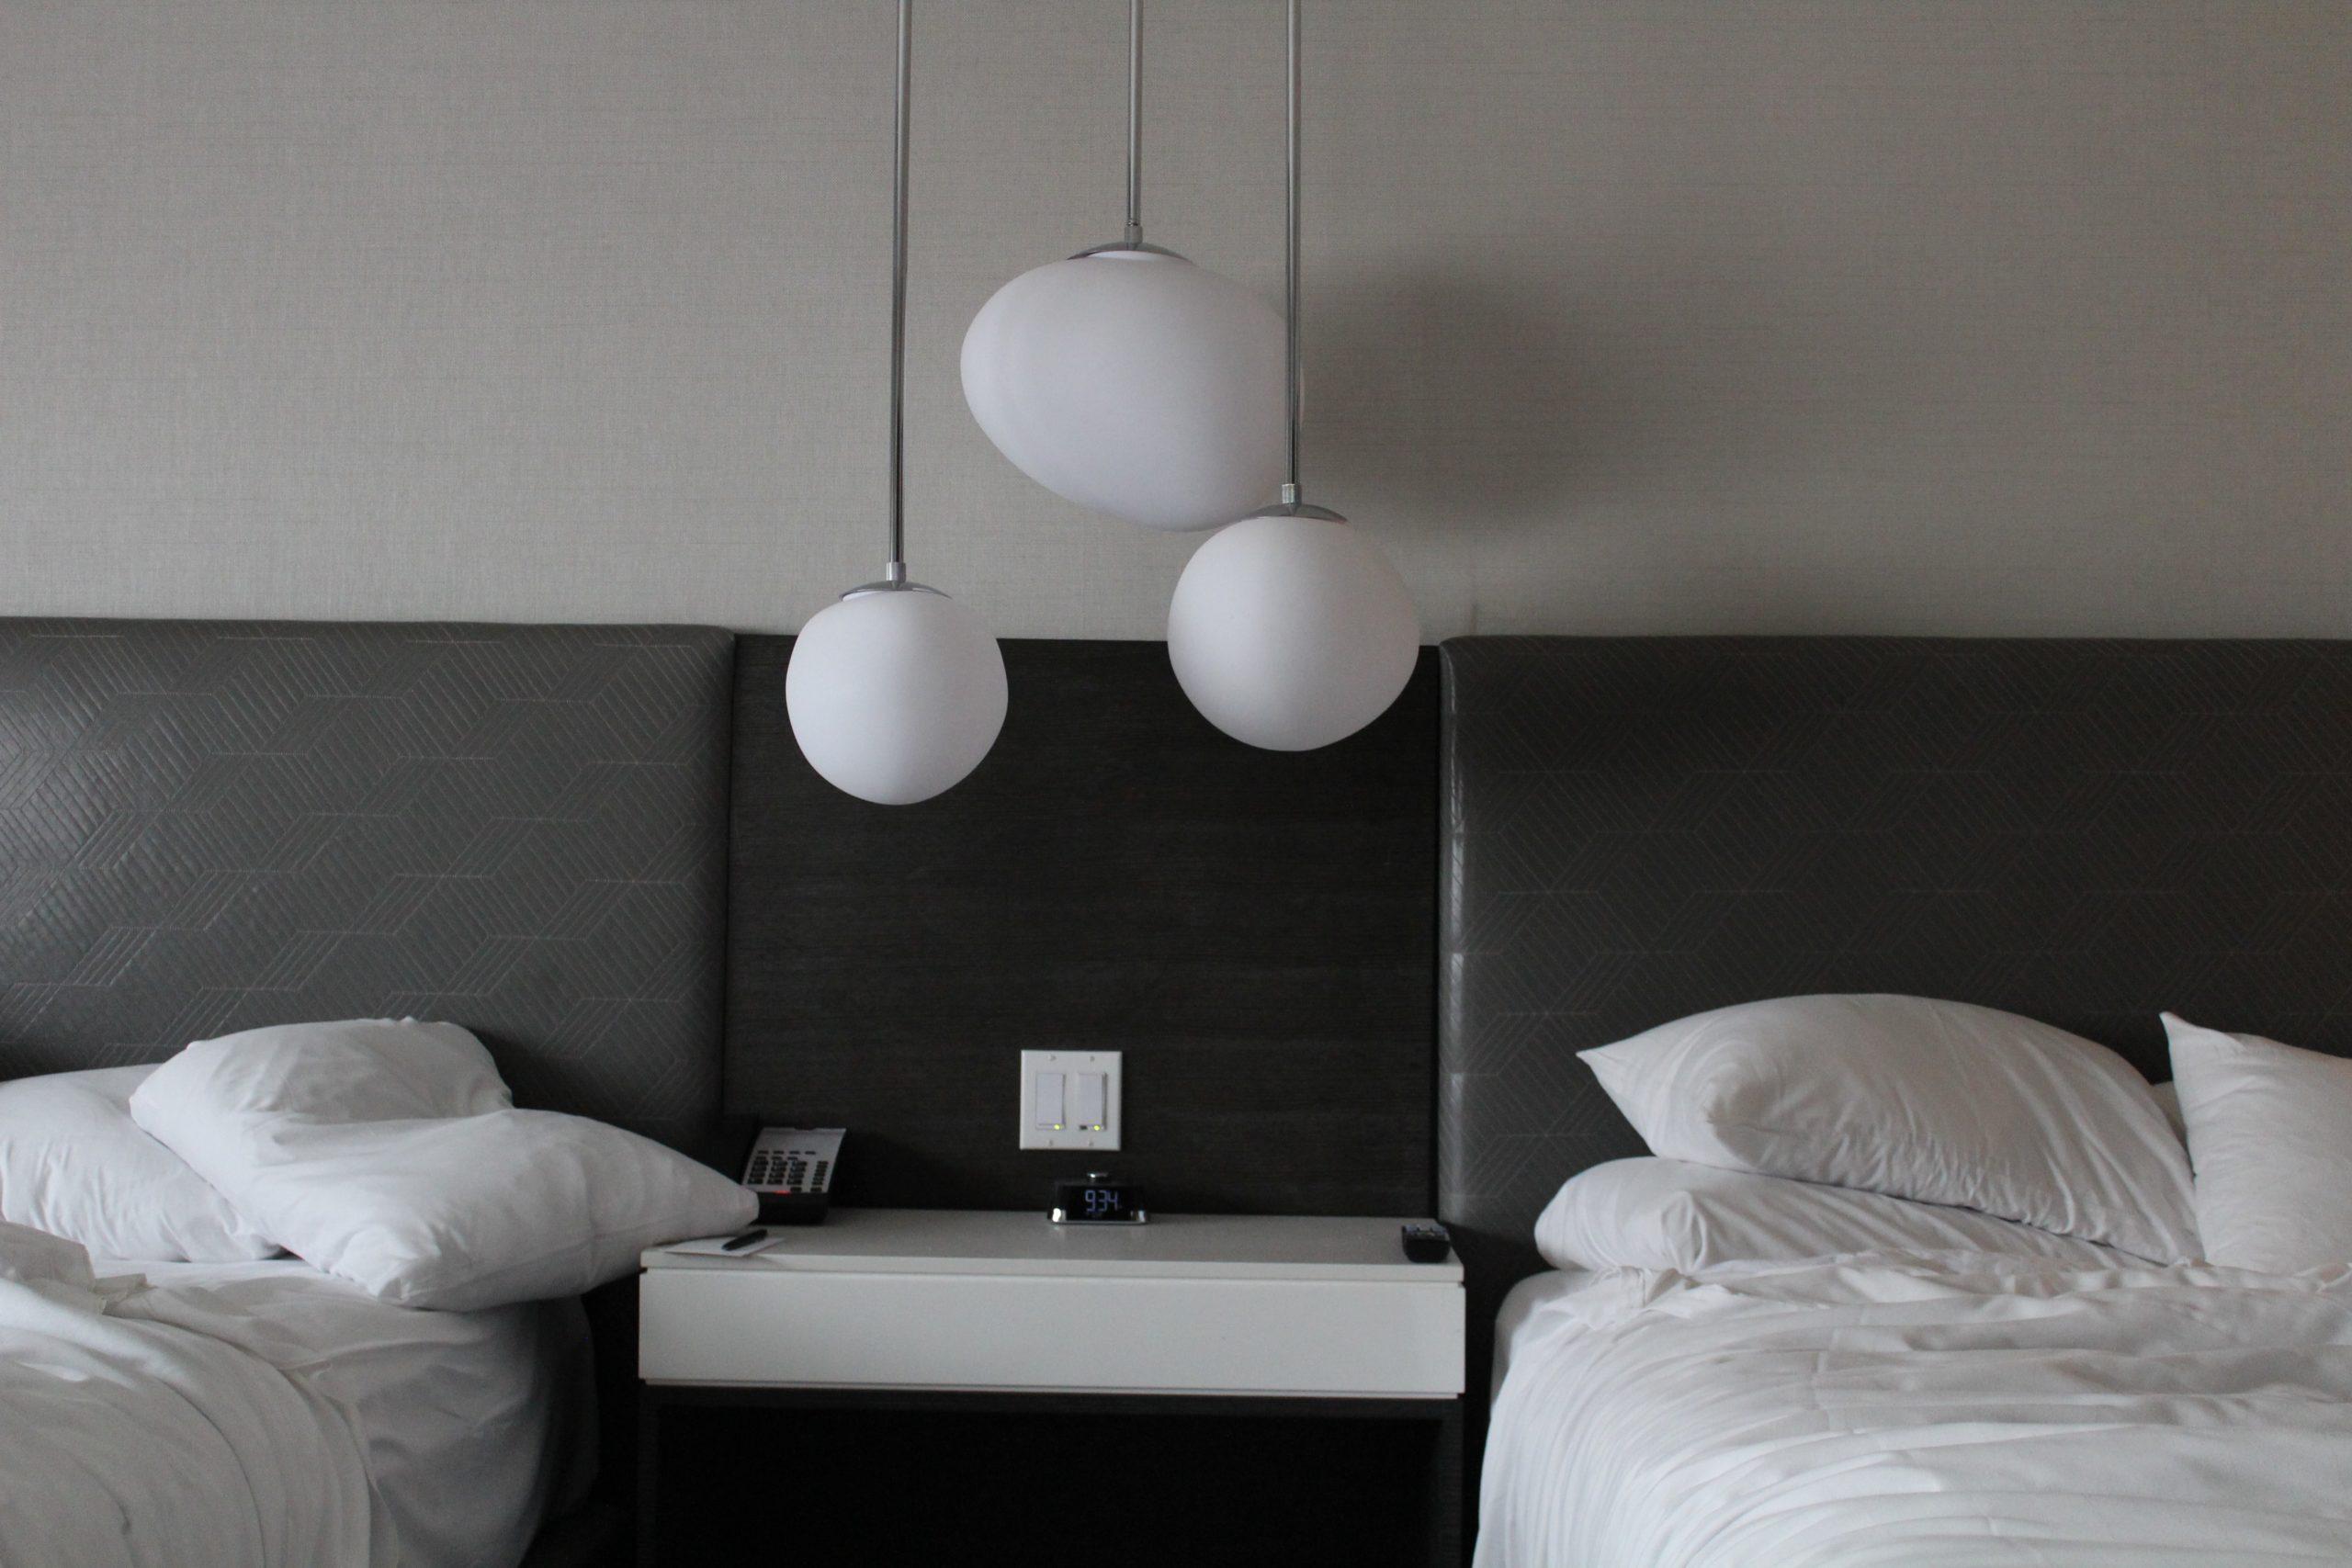 hotel room bedside lighting feature